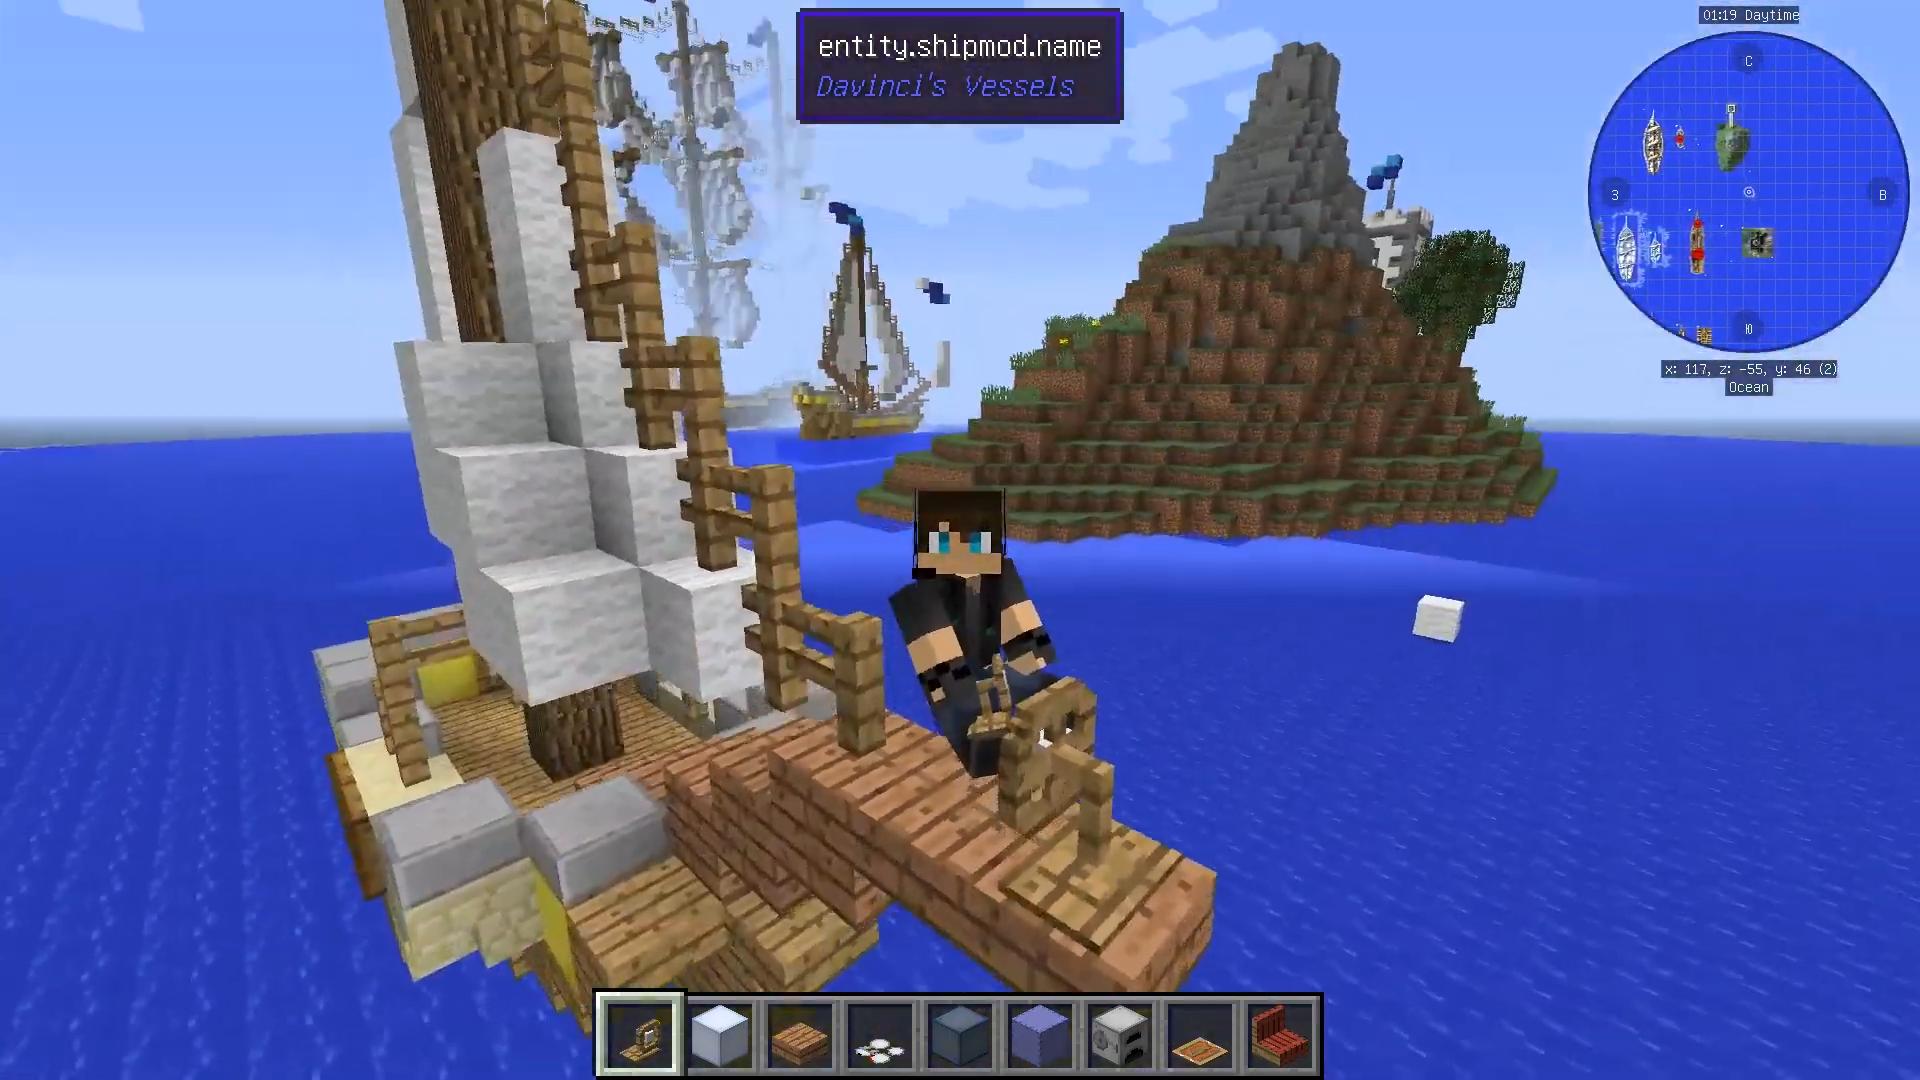 Мод Davincis Vessels (Корабли) - скриншот 4